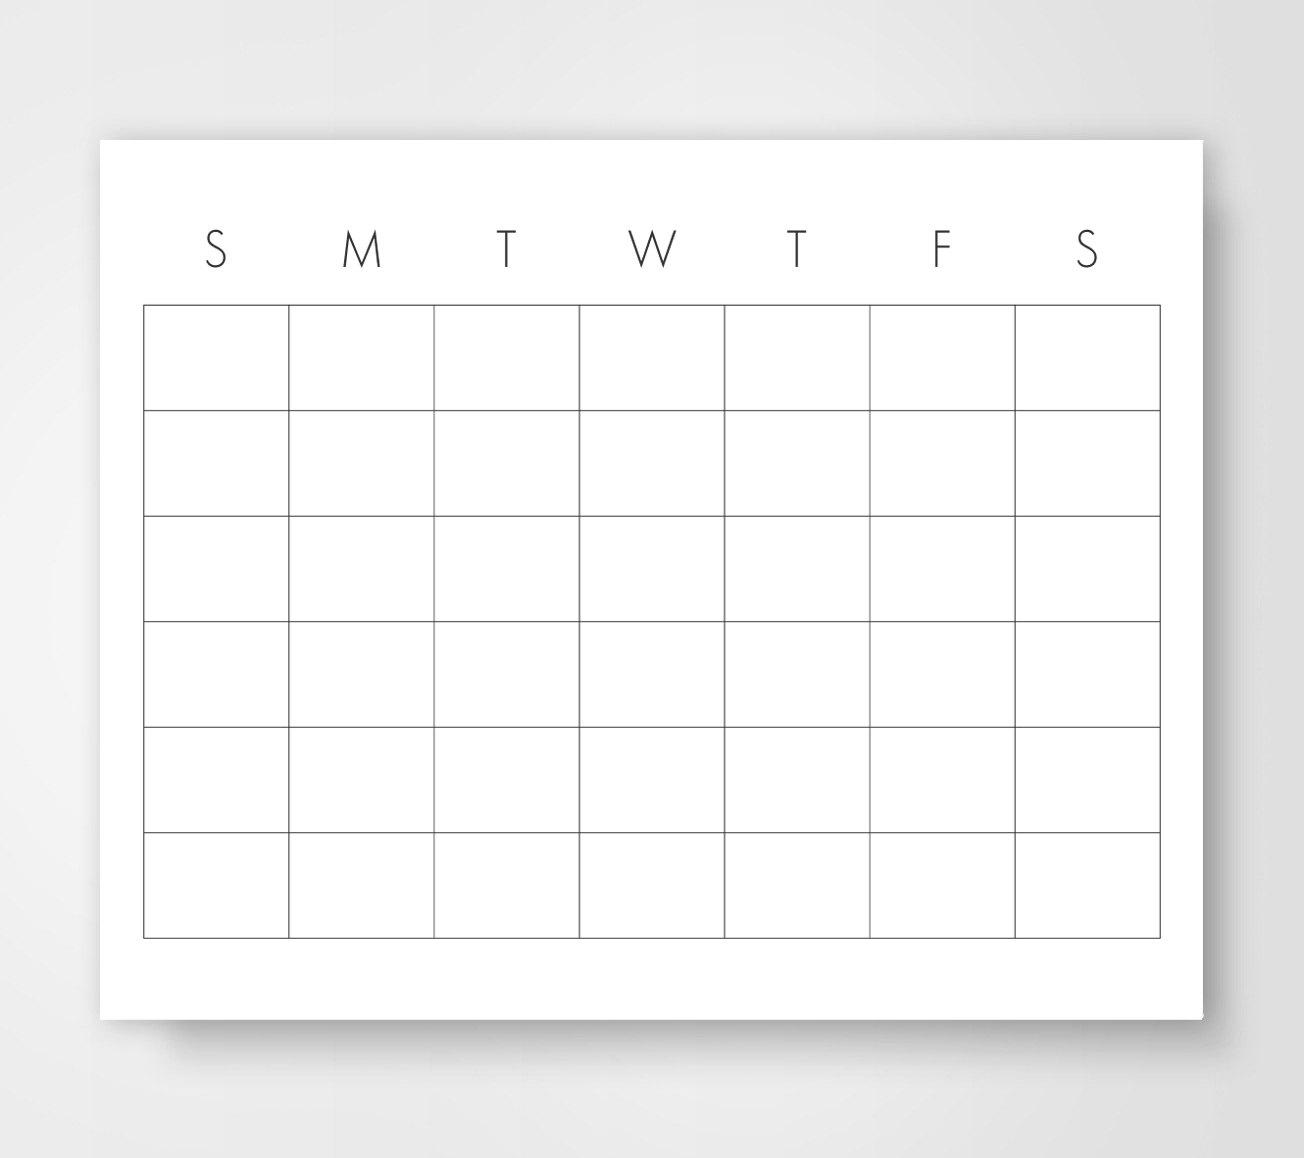 8 5 x 11 calendar template - 28 images - 8 5 x 11 ...